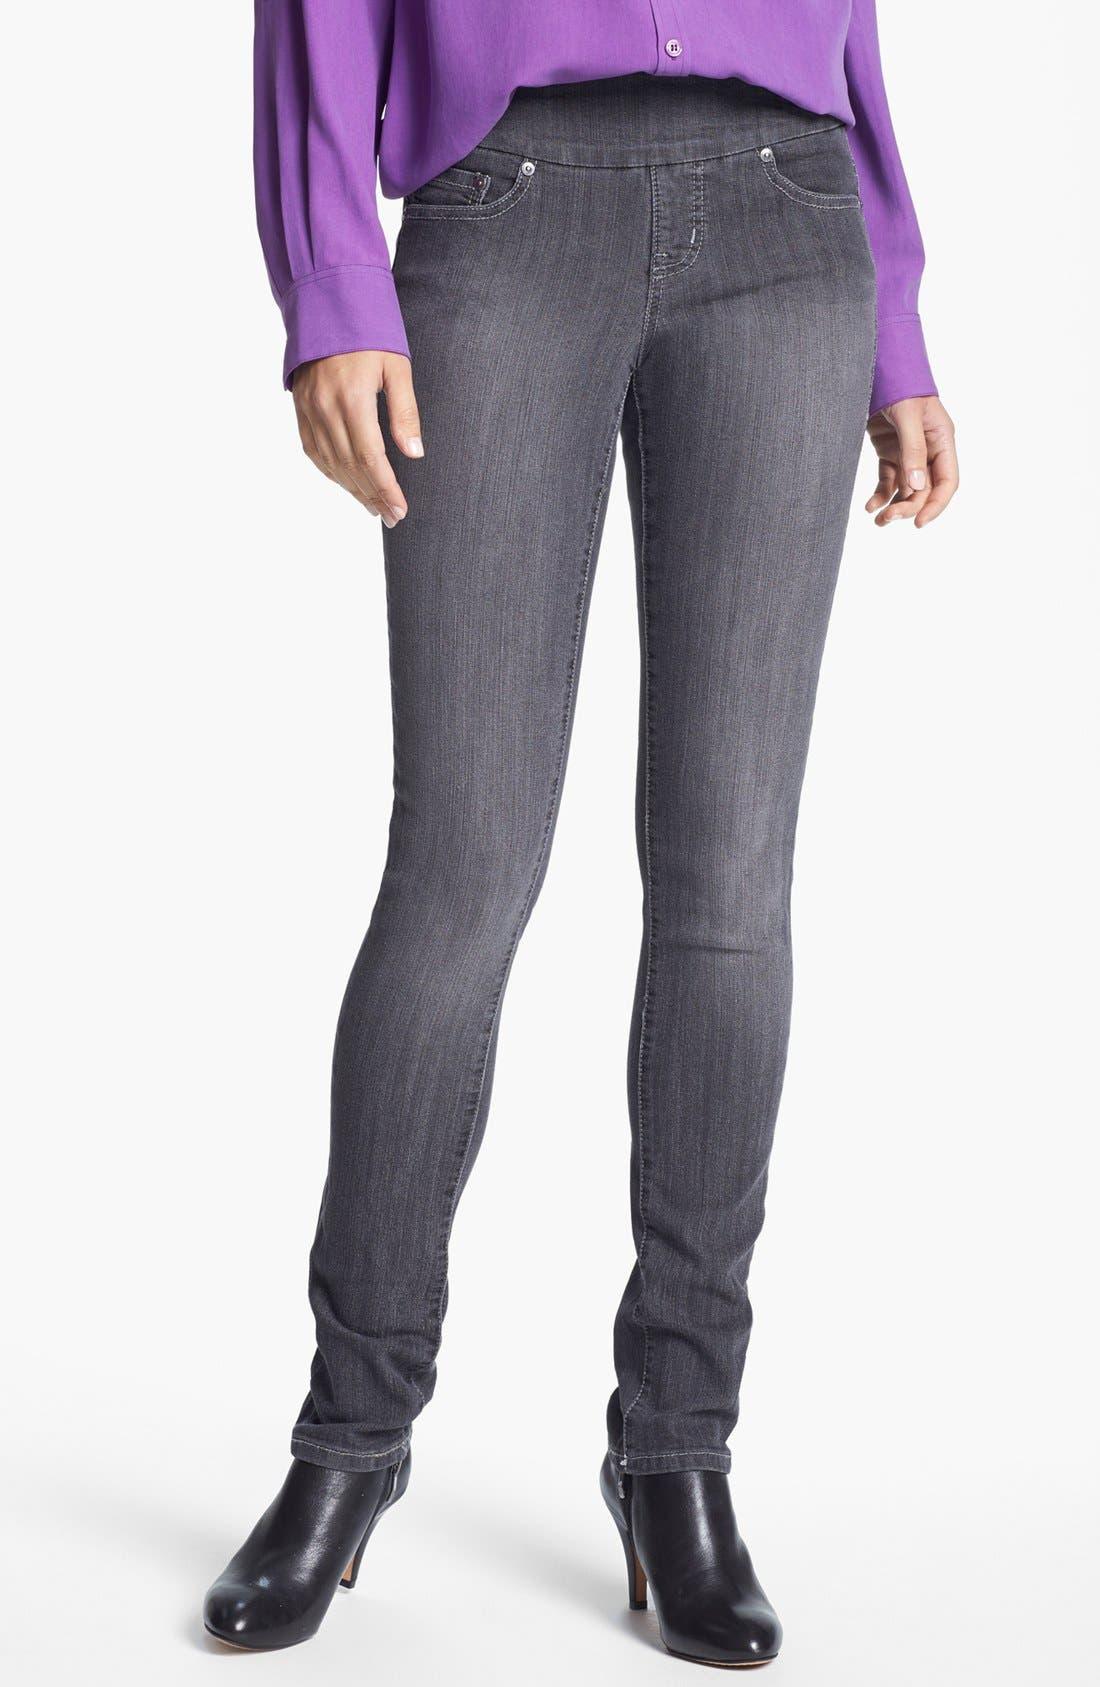 Main Image - Jag Jeans 'Malia' Slim Leg Stretch Jeans (Grey)